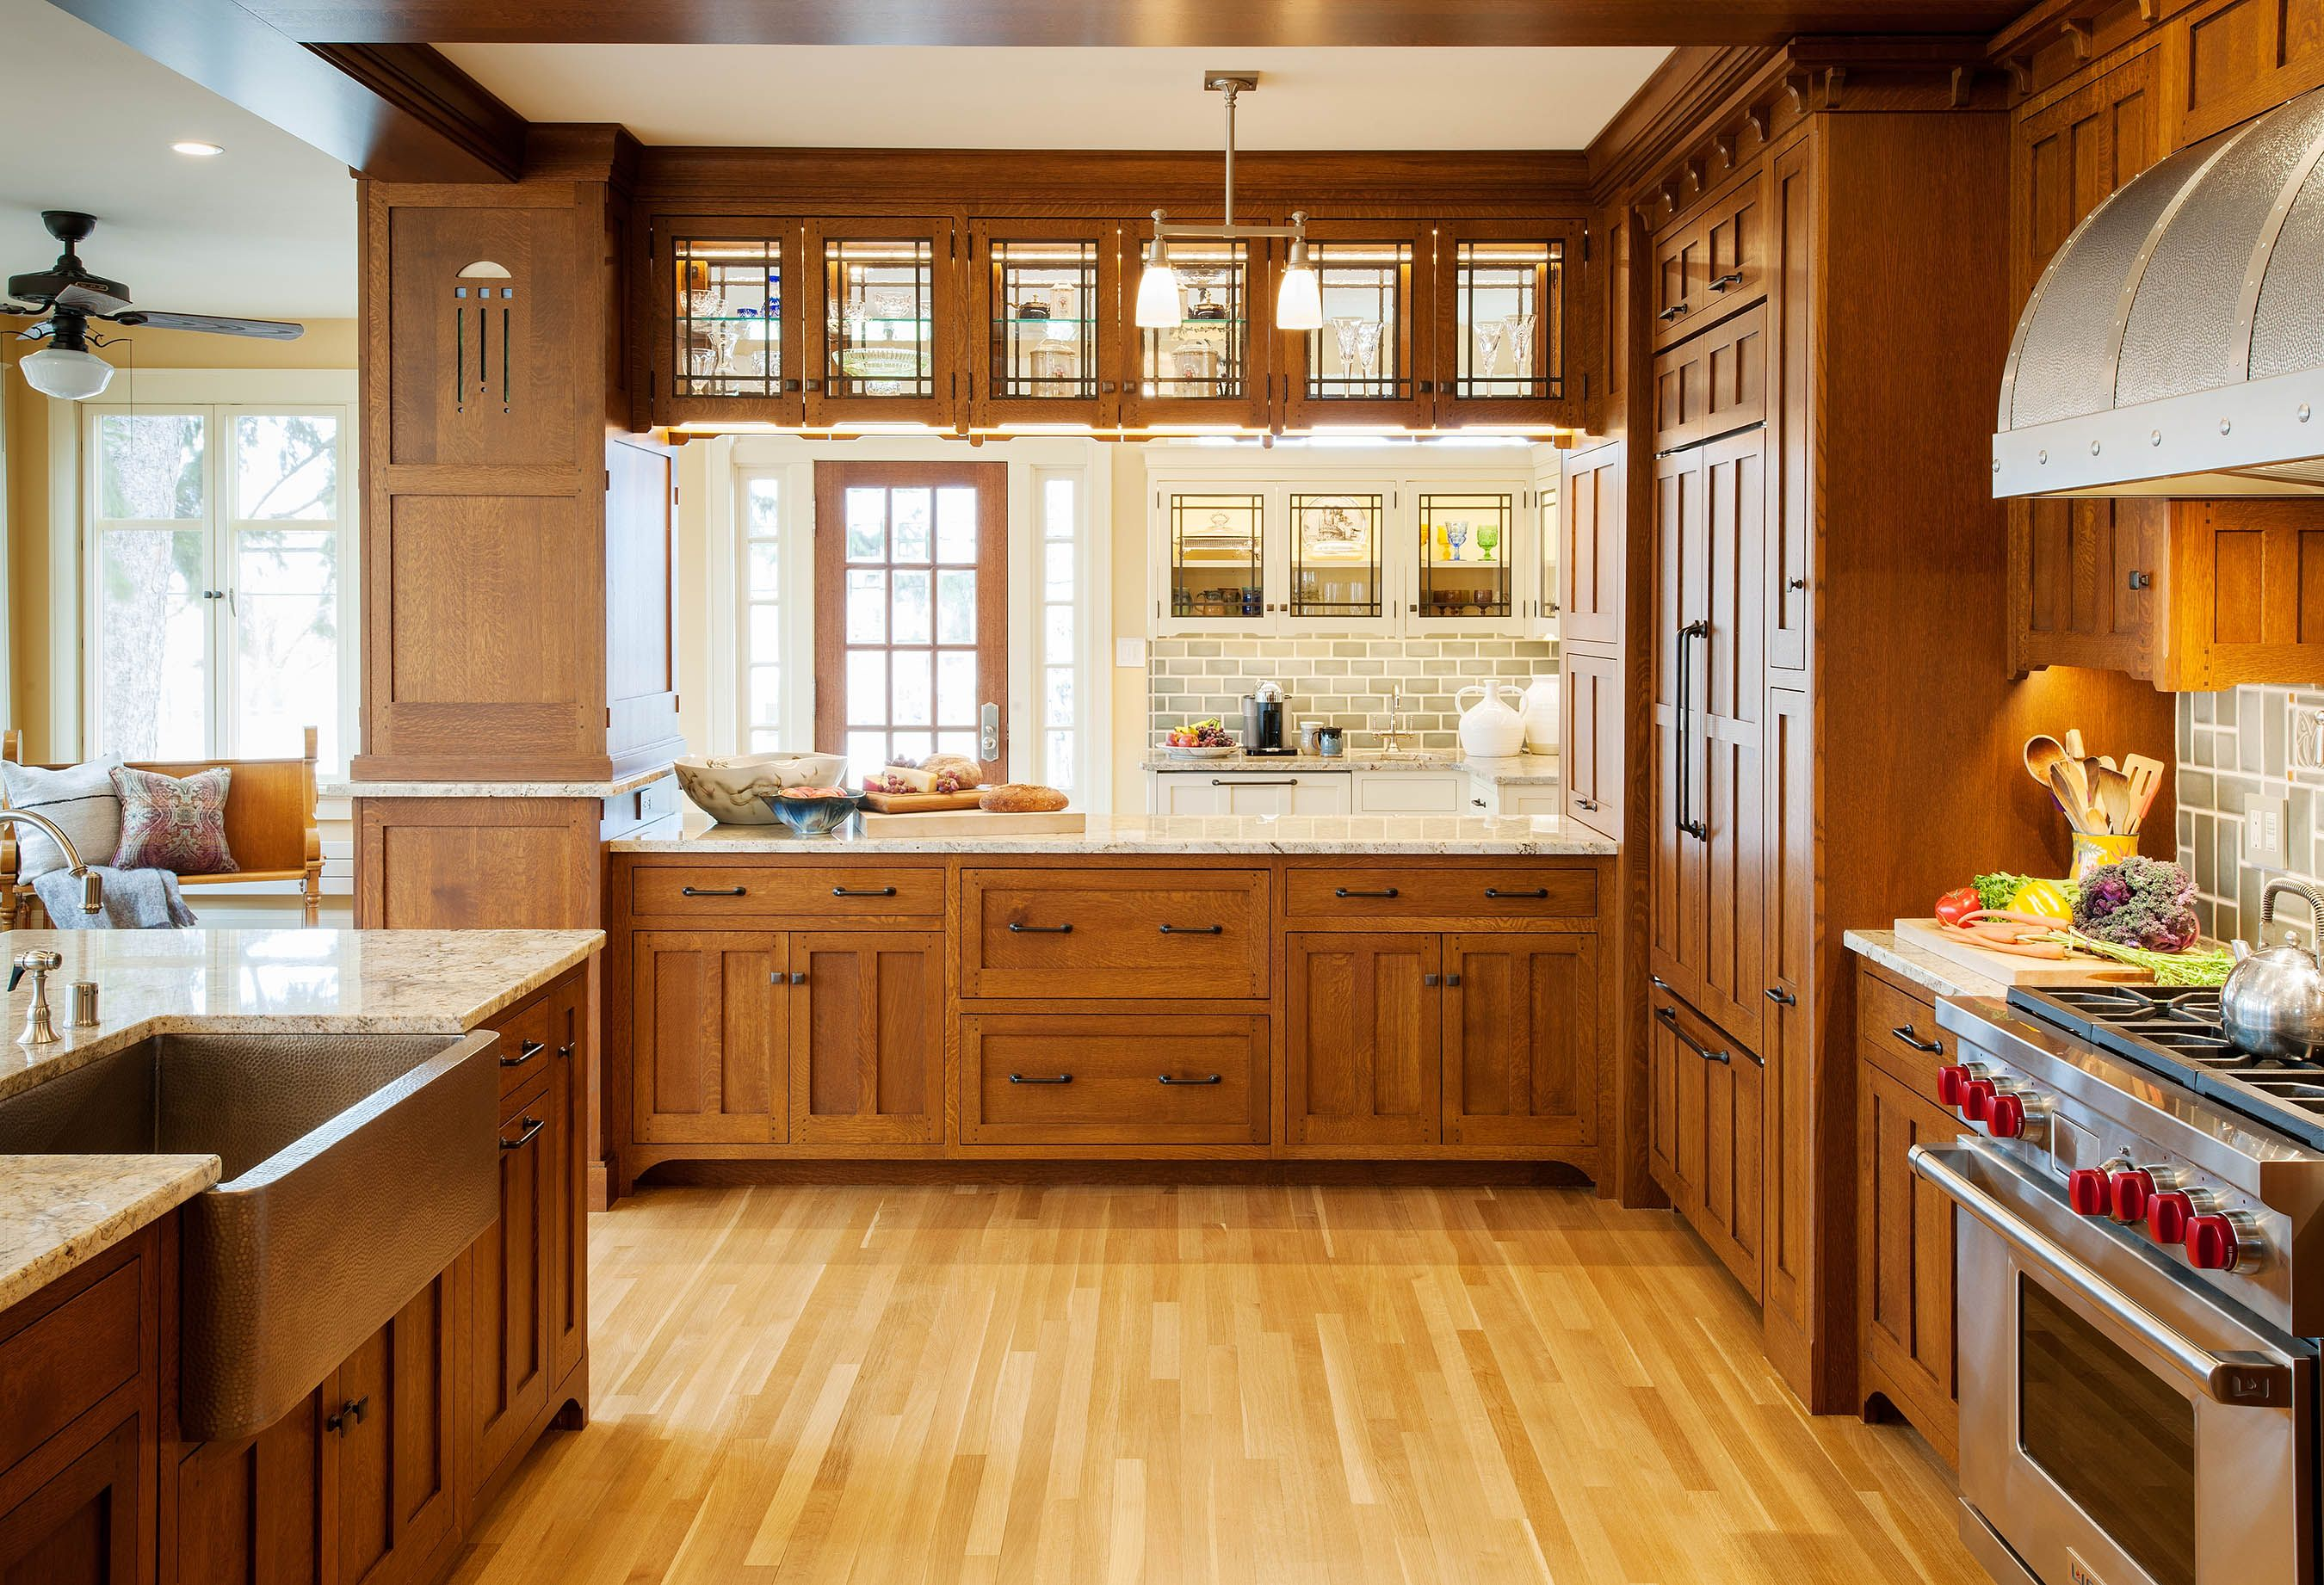 Pin By Jane Helstrom On Arts Crafts Craftsman Style Kitchens Craftsman Style Homes Craftsman Style Kitchen